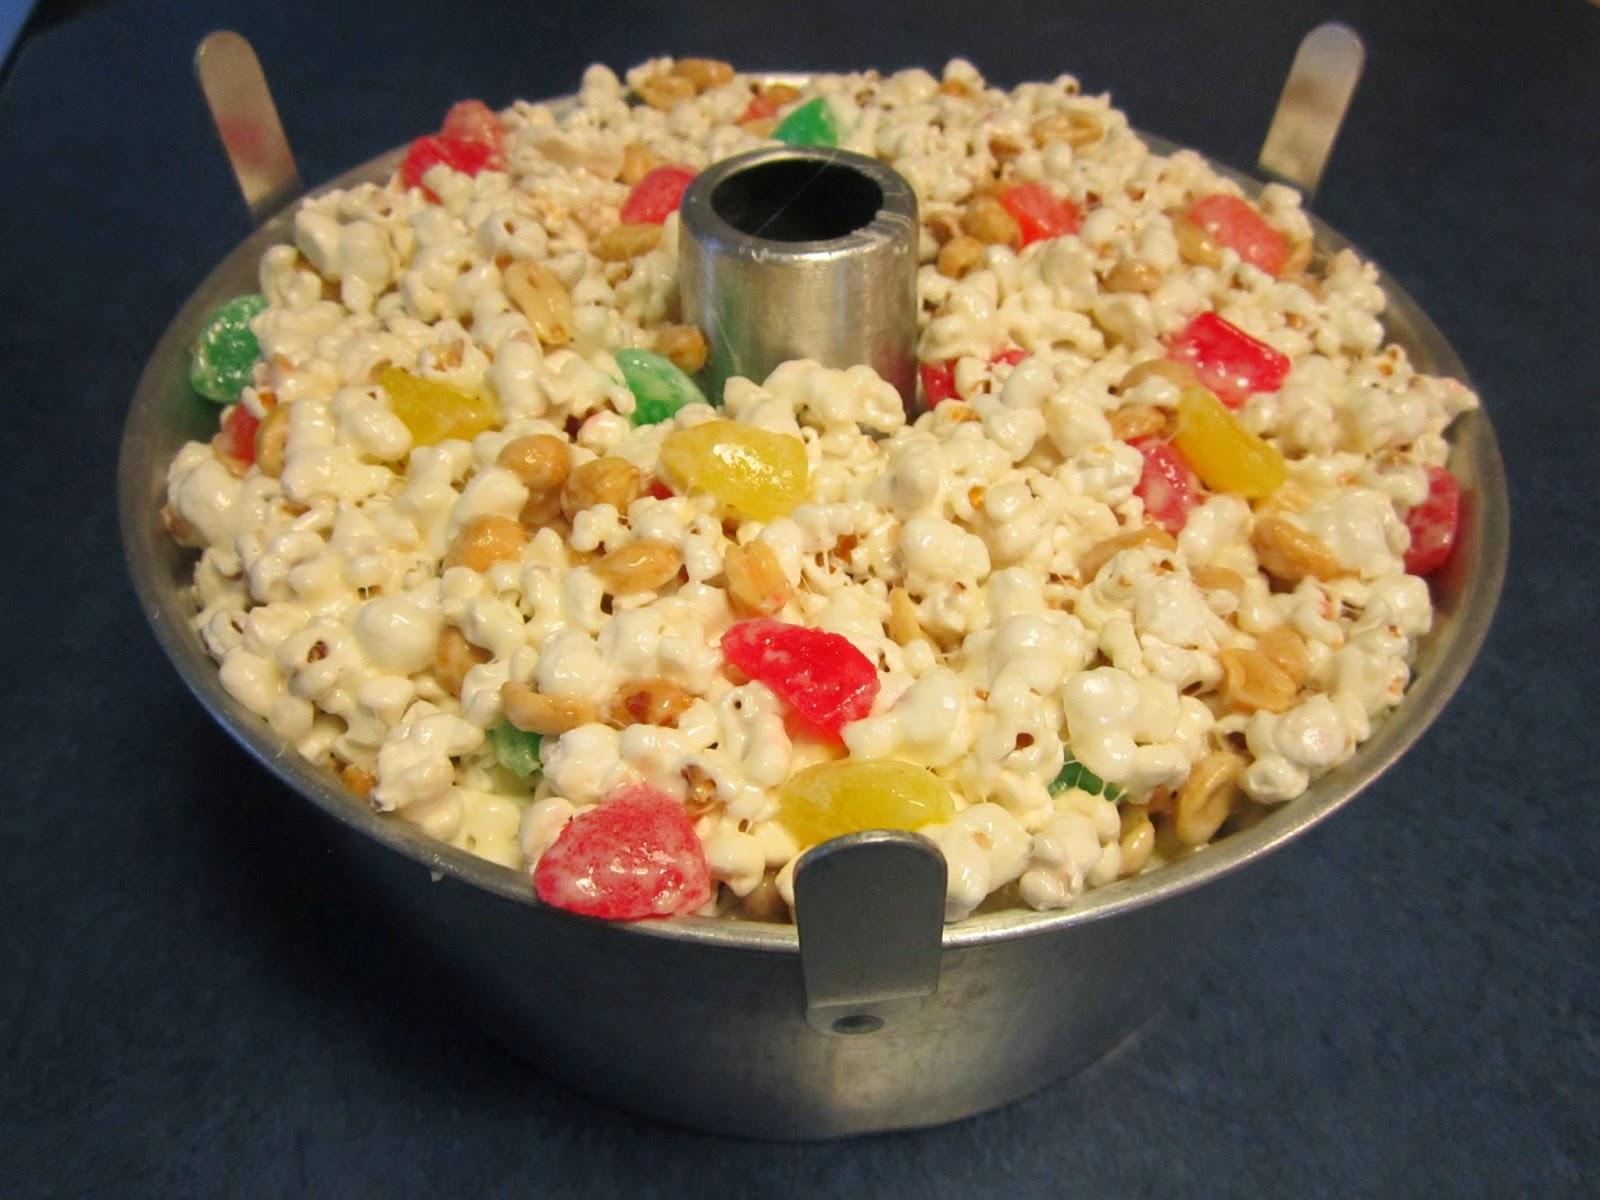 Popcorn gumdrop cake recipe